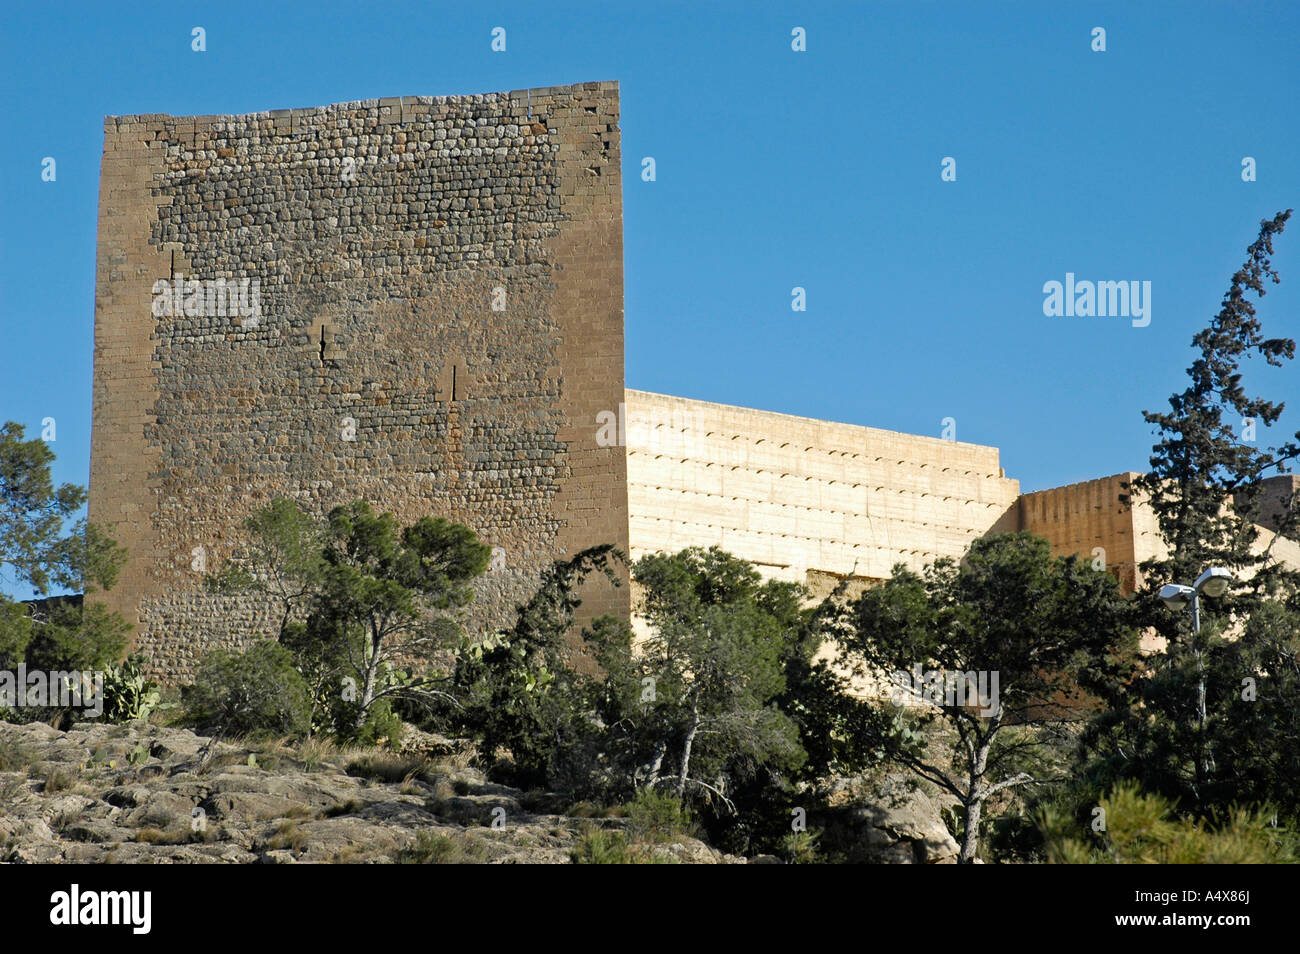 Moorish stronghold, castillo de la Mola, Novelda, Alicante, Costa Blanca, Spain - Stock Image